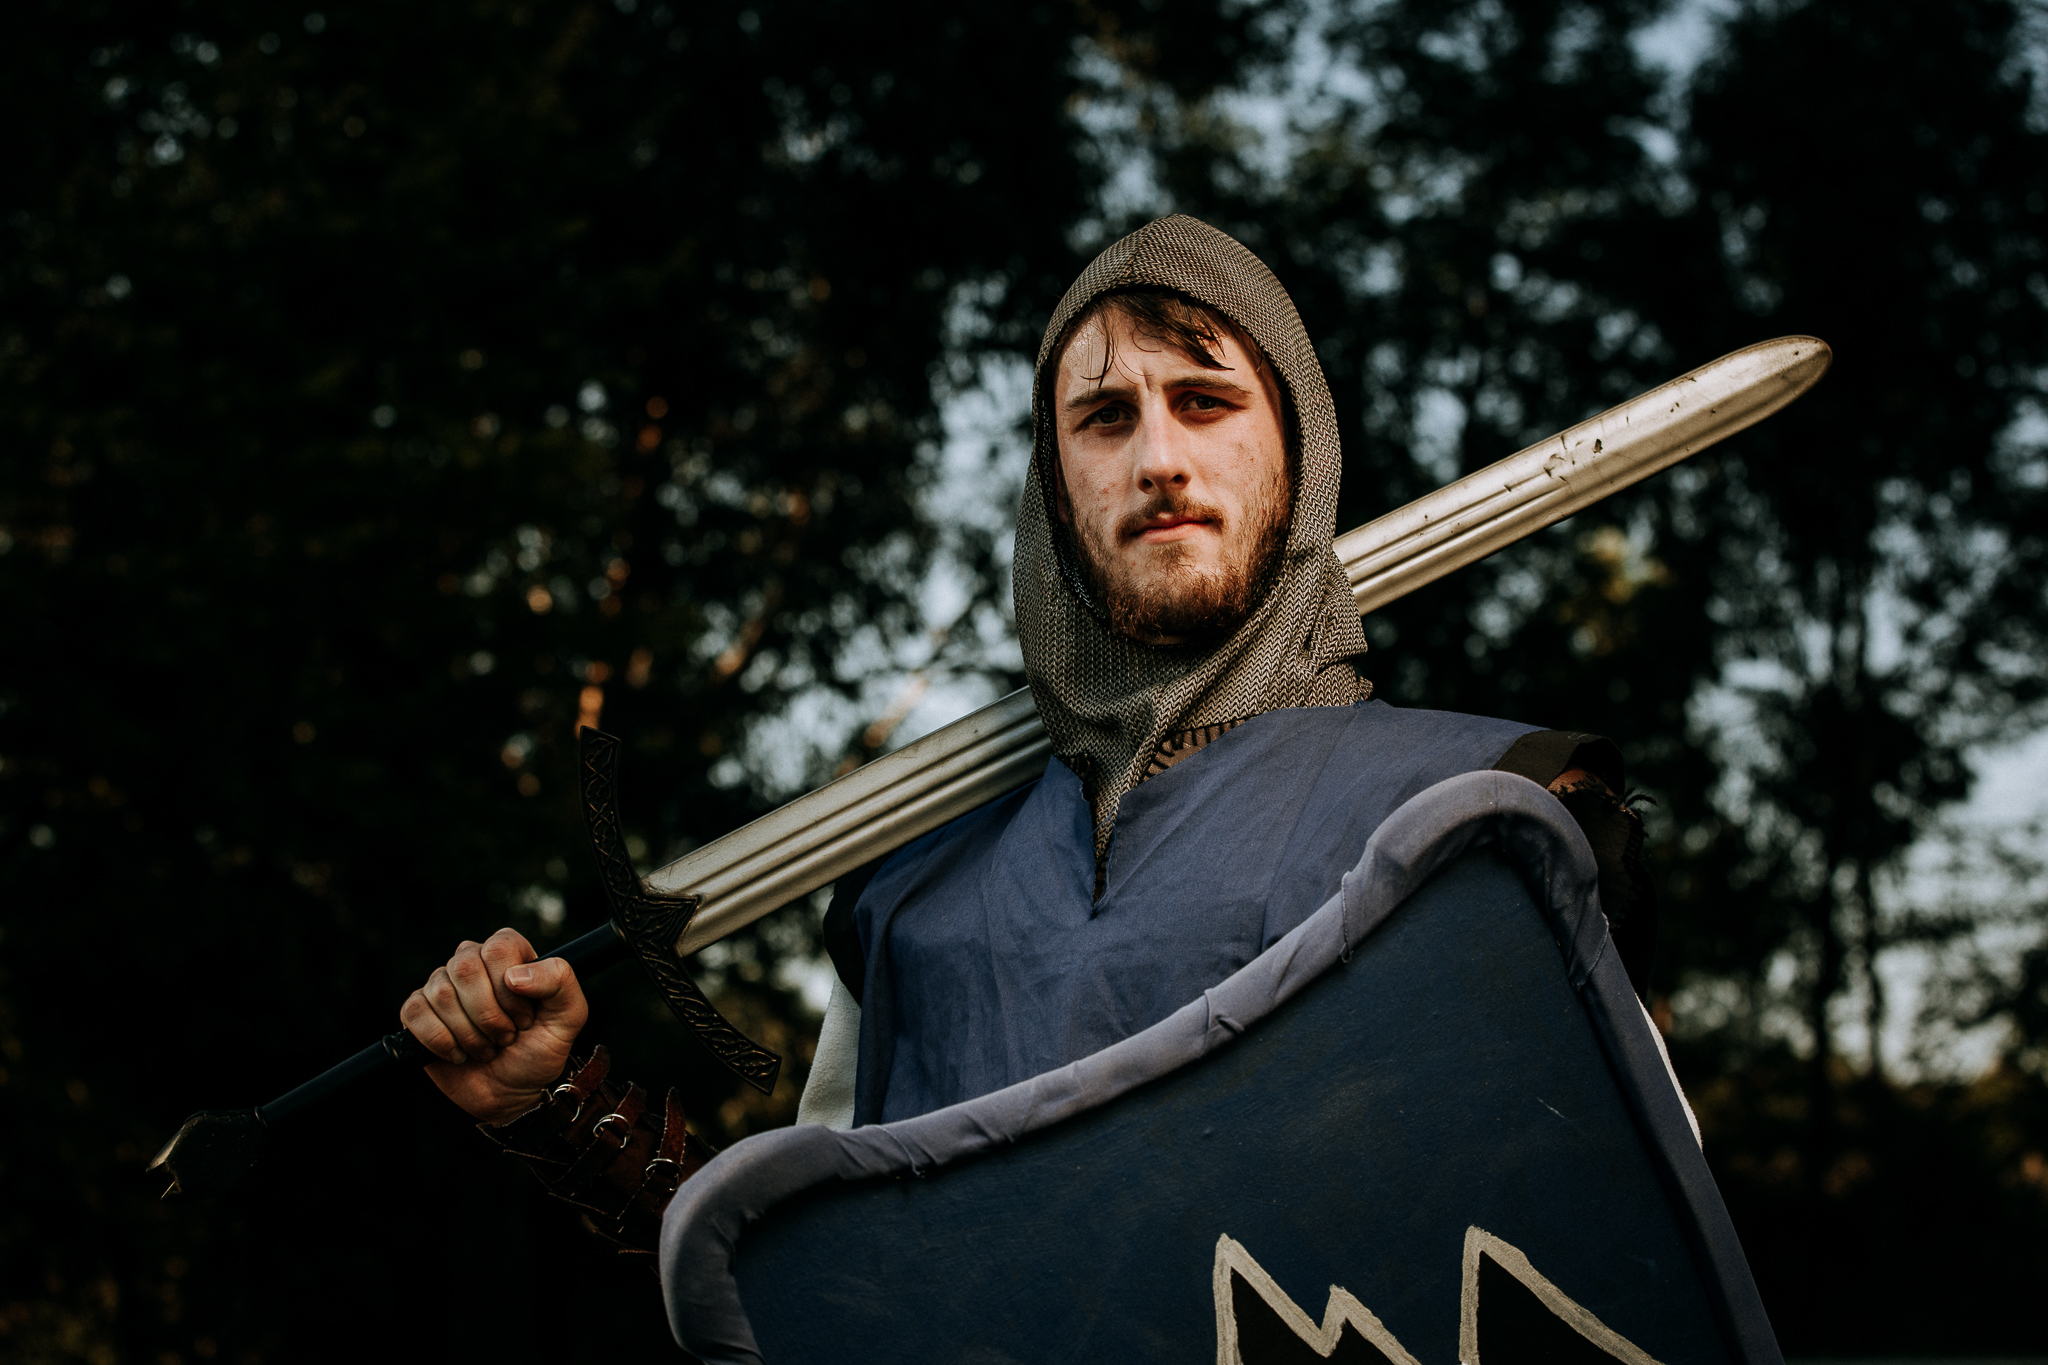 Swordcraft-1569_LR.jpg